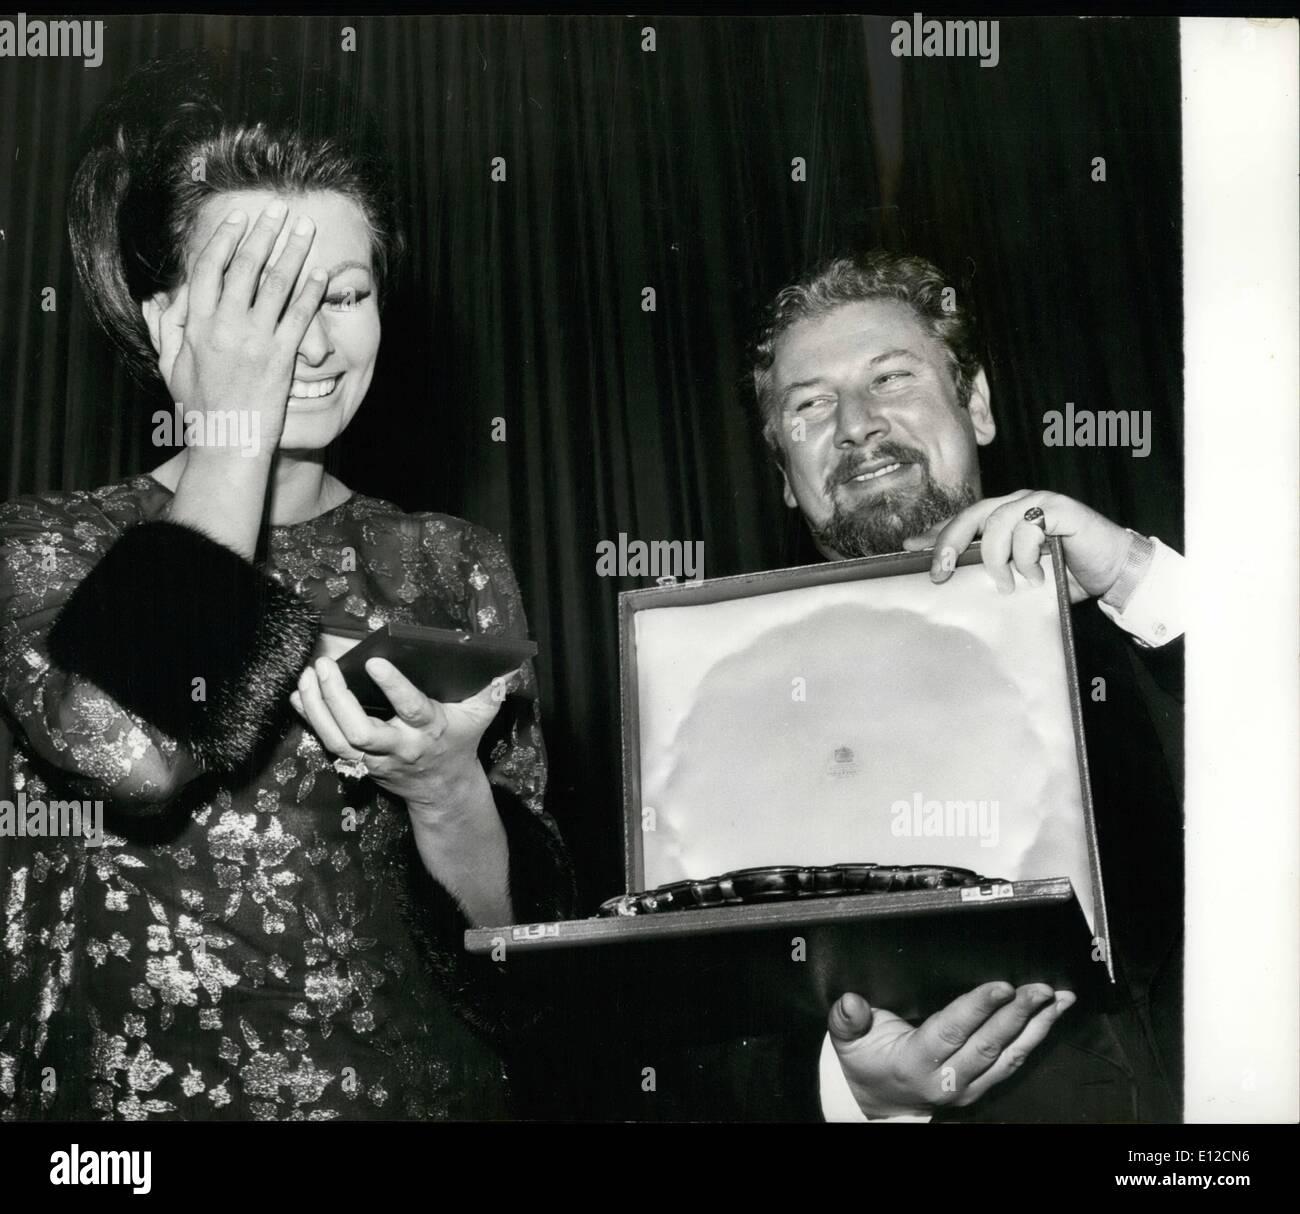 Dec. 16, 2011 - Sophia Loren presented with Gold Star Award when she attends the premiere of her film. Sophia Loren - Stock Image